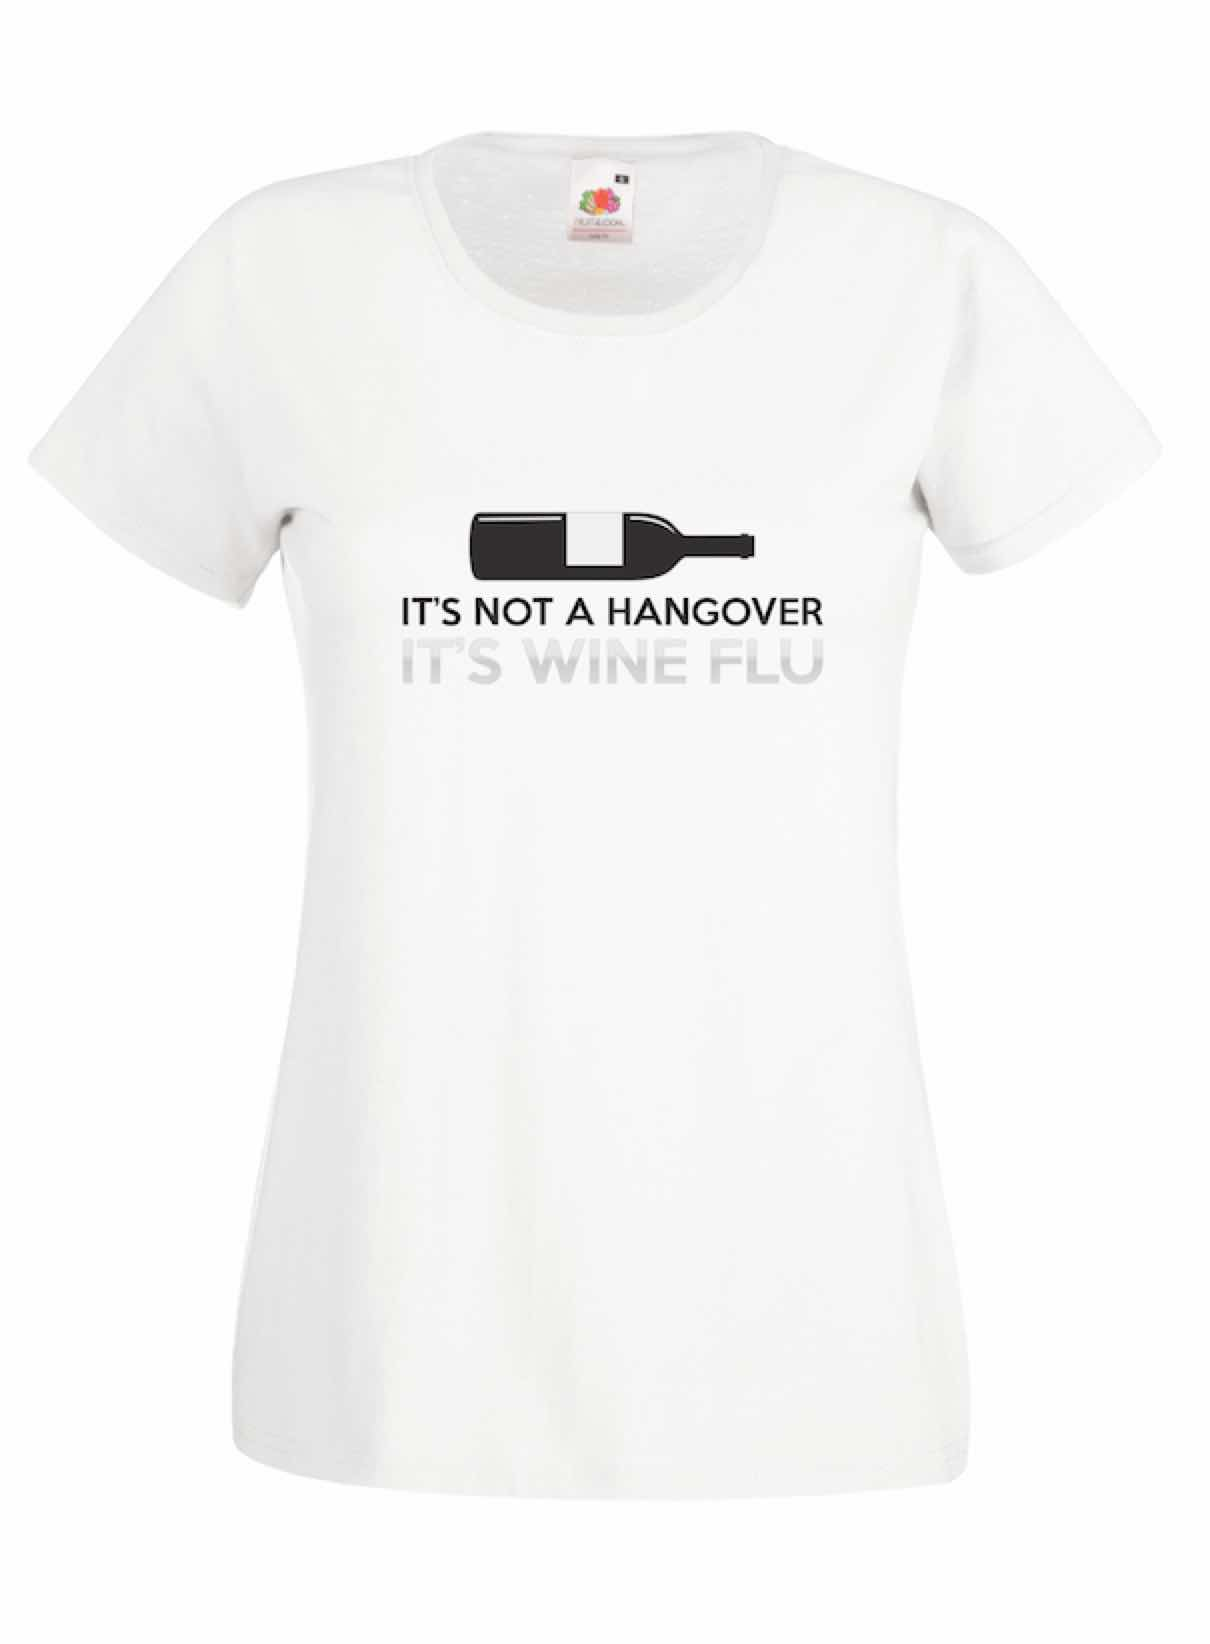 Wine Flu design for t-shirt, hoodie & sweatshirt